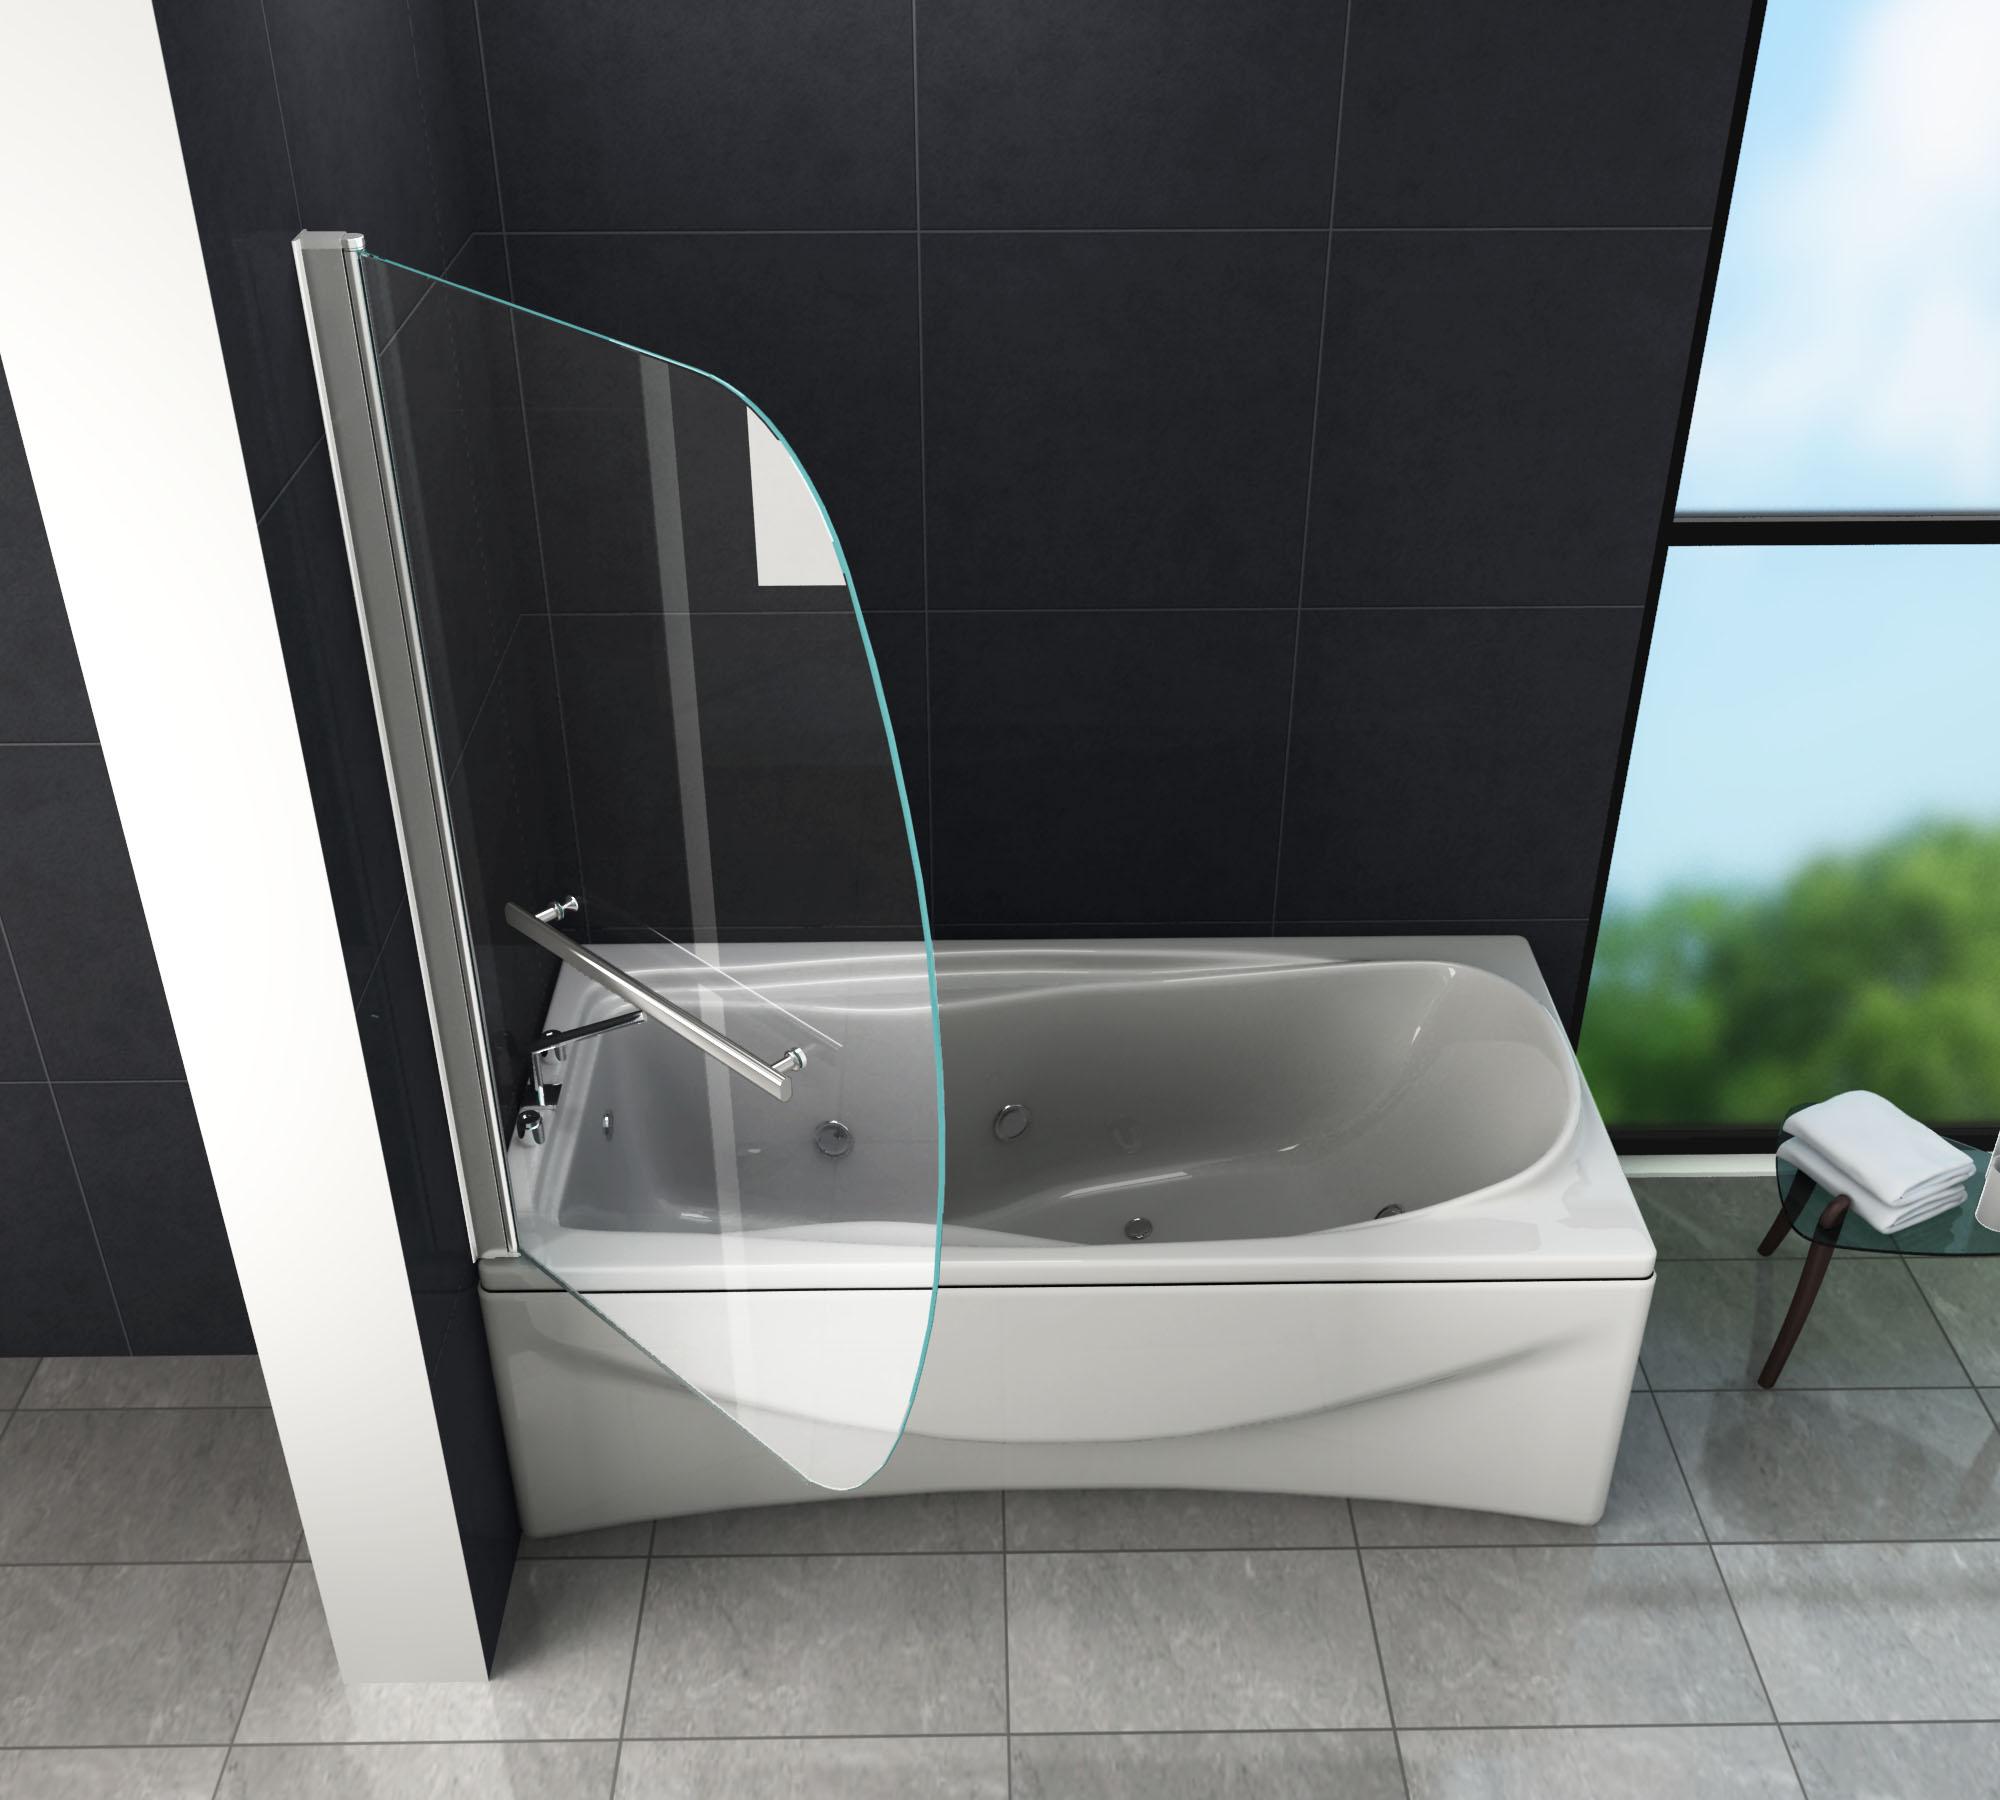 Duschtrennwand moon 90 x 140 badewanne glasdeals - Badewanne duschtrennwand ...